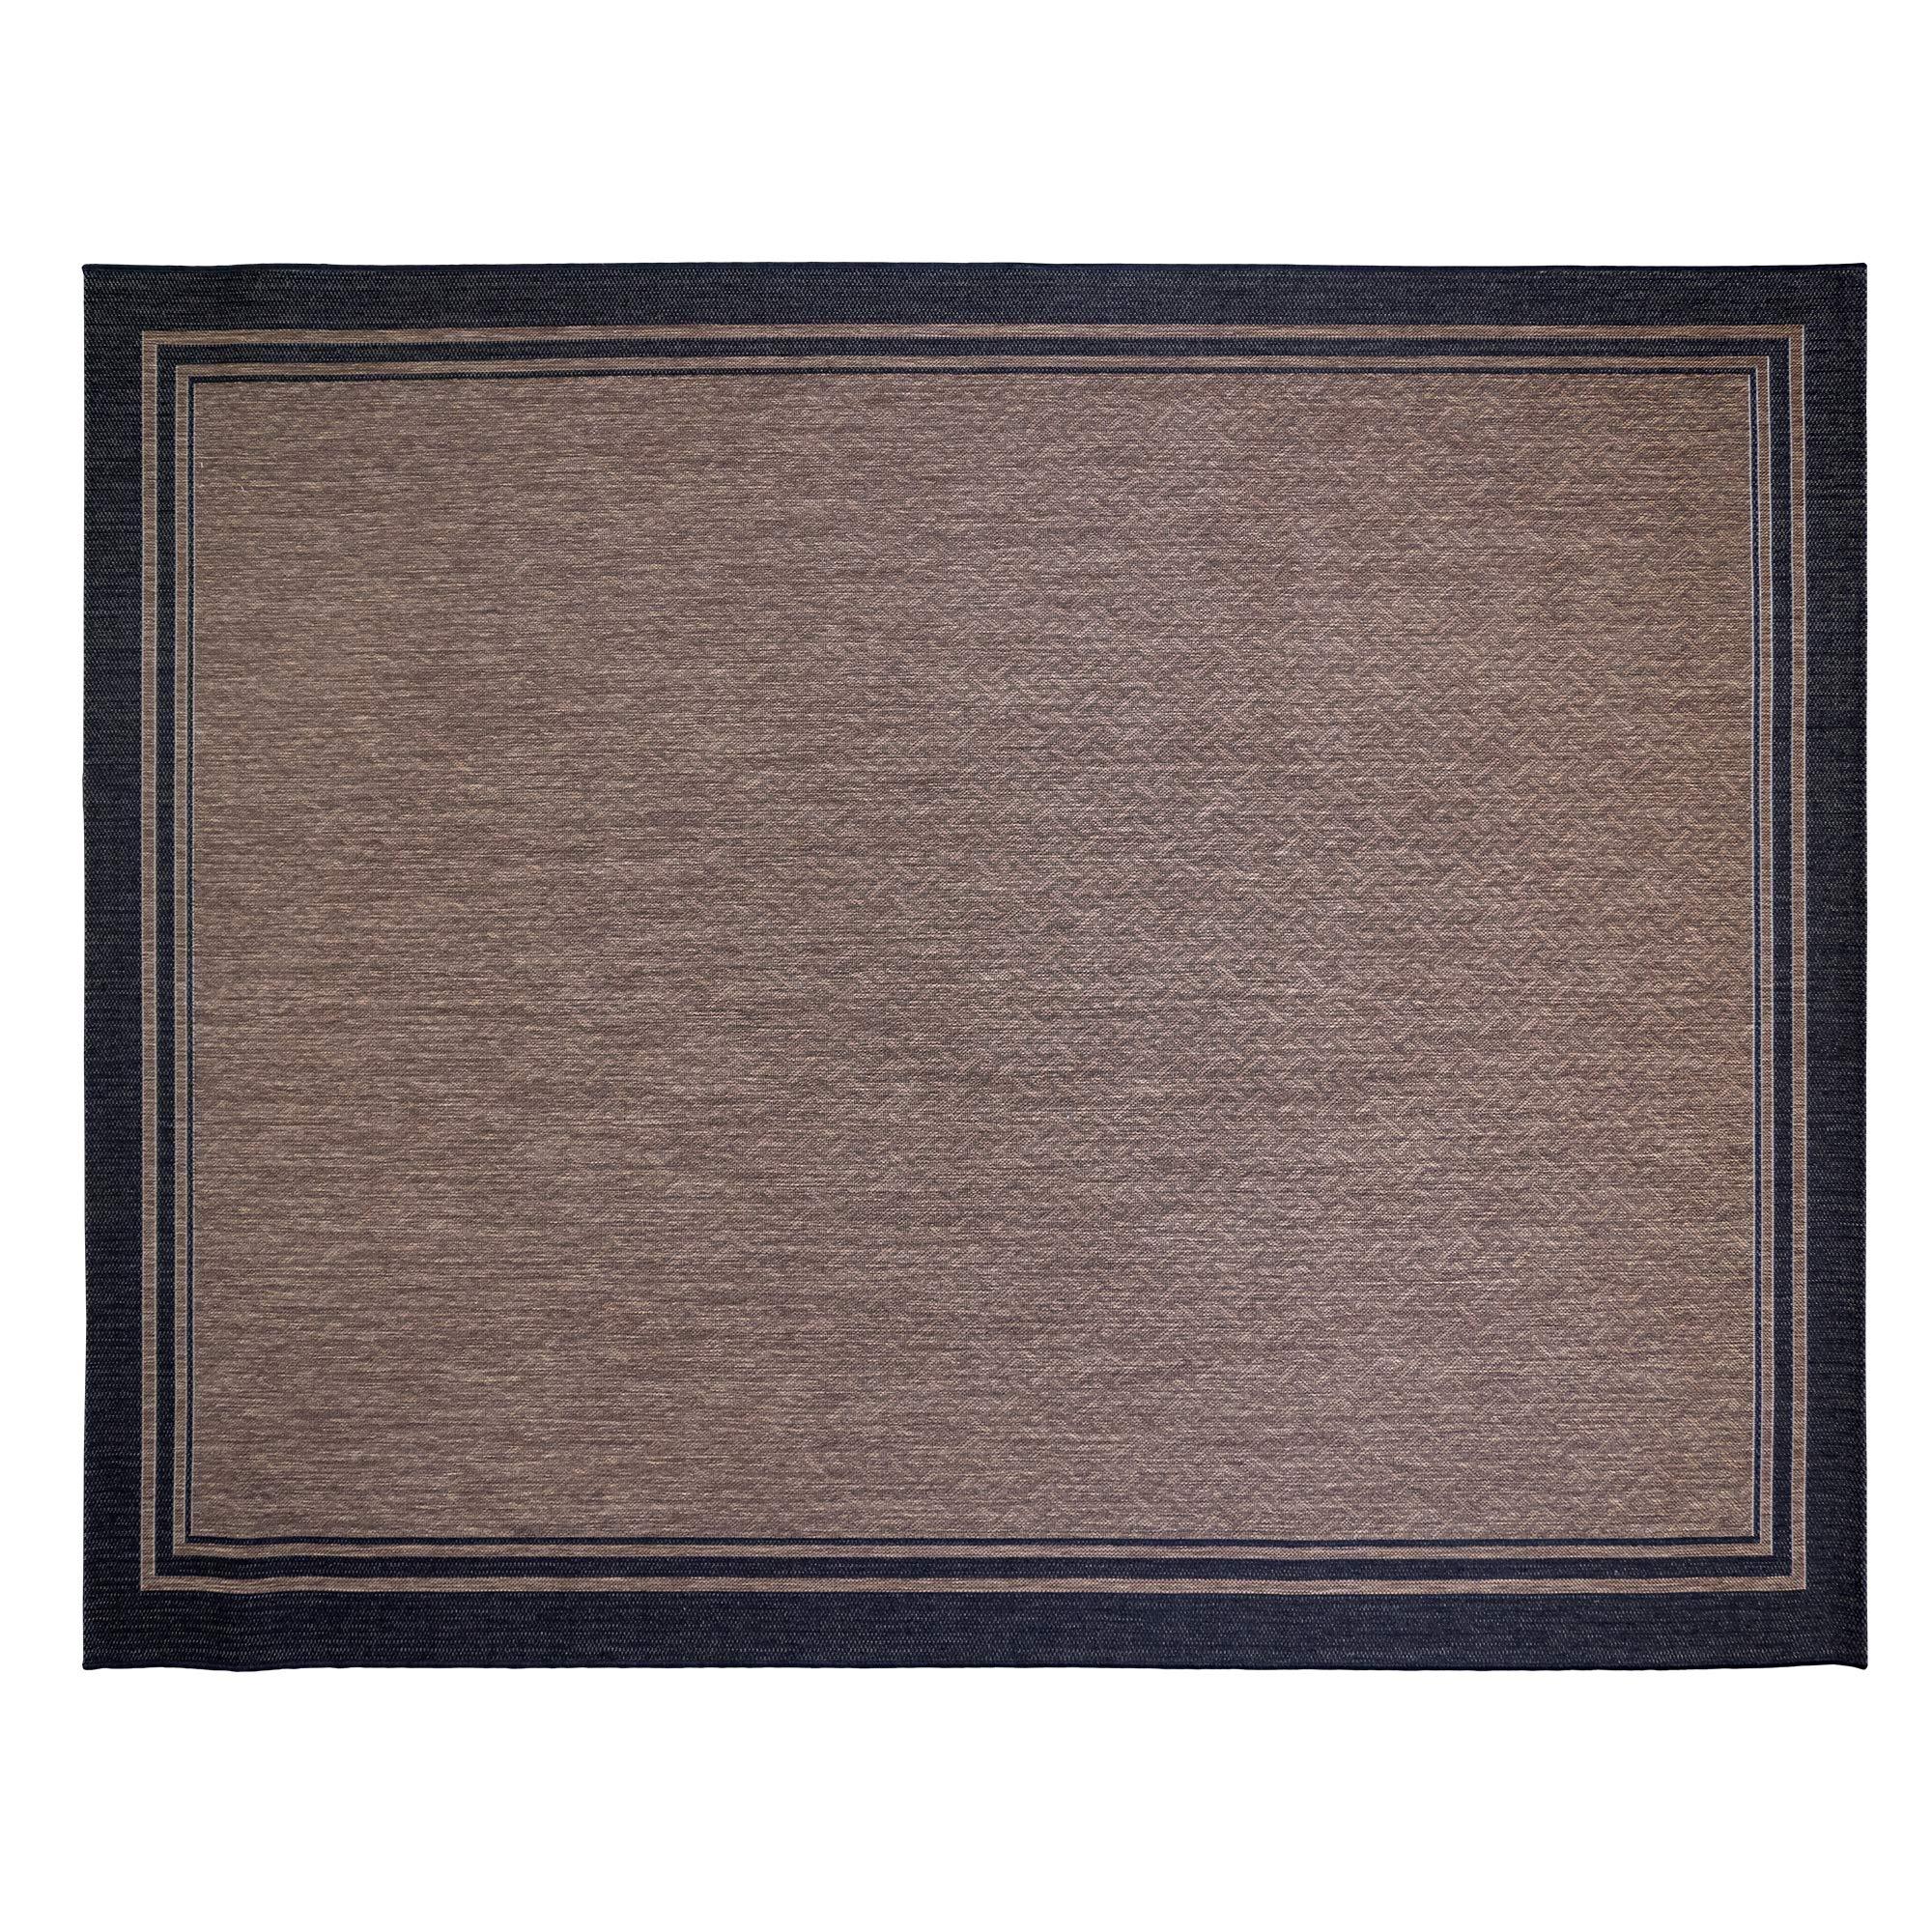 Gertmenian 21515 Coastal Tropical Carpet Outdoor Patio Rug, 8x10 Large, Black Border Dark